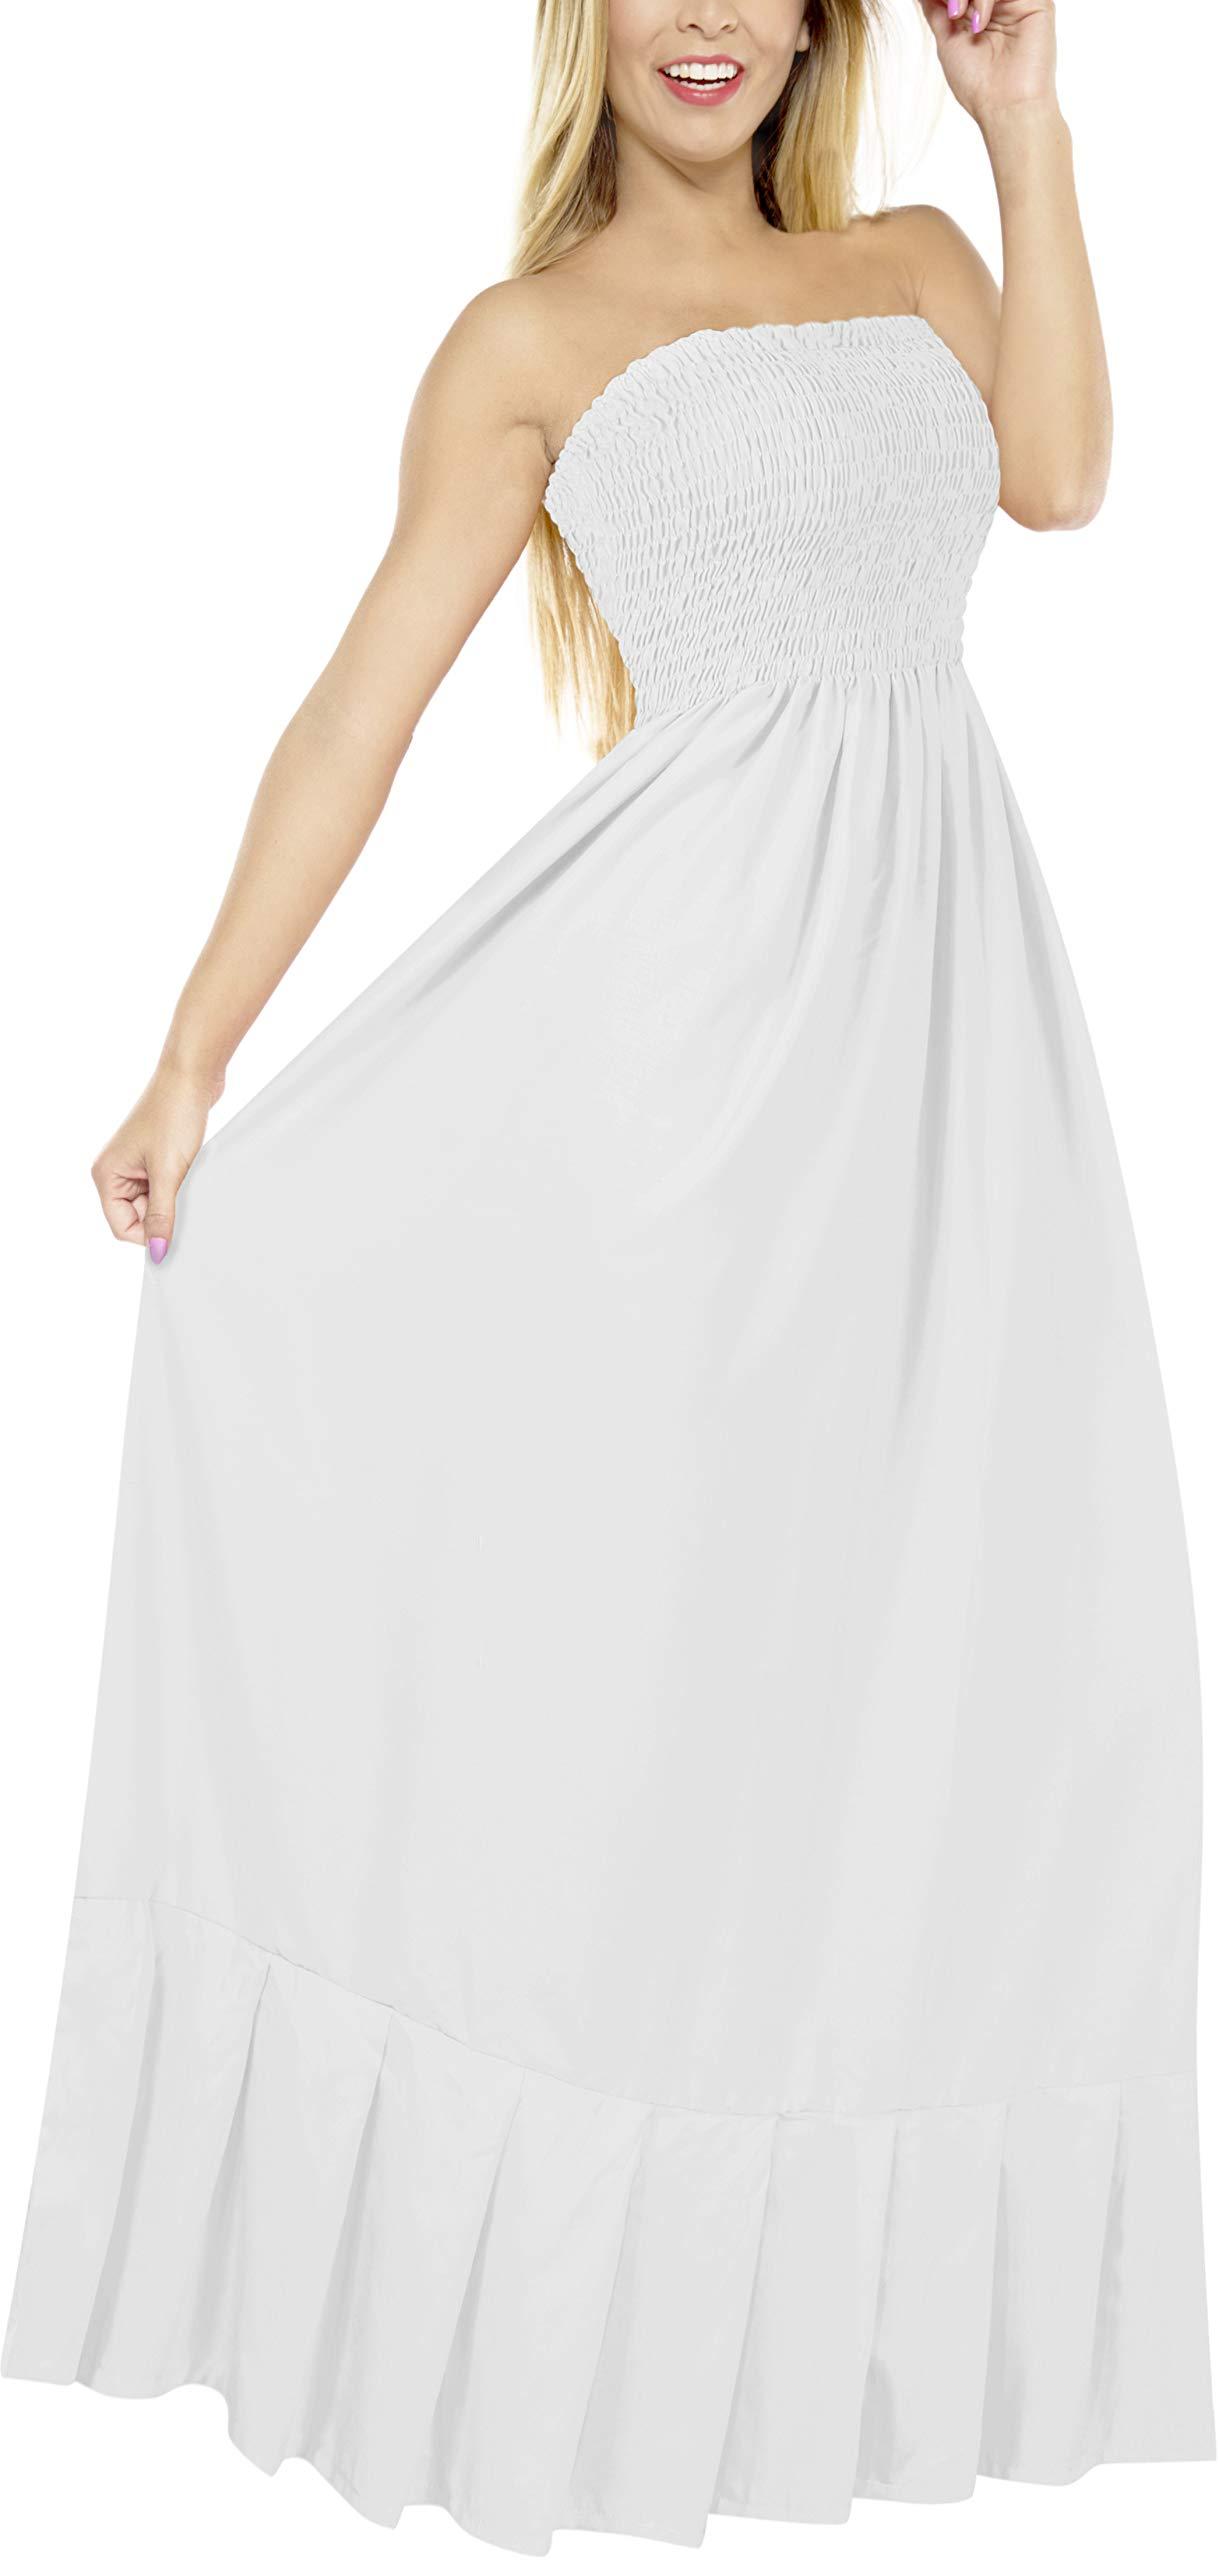 LA LEELA Womens Plus Size Summer Casual Tube Dress Beach Cover Up Hand Tie Dye